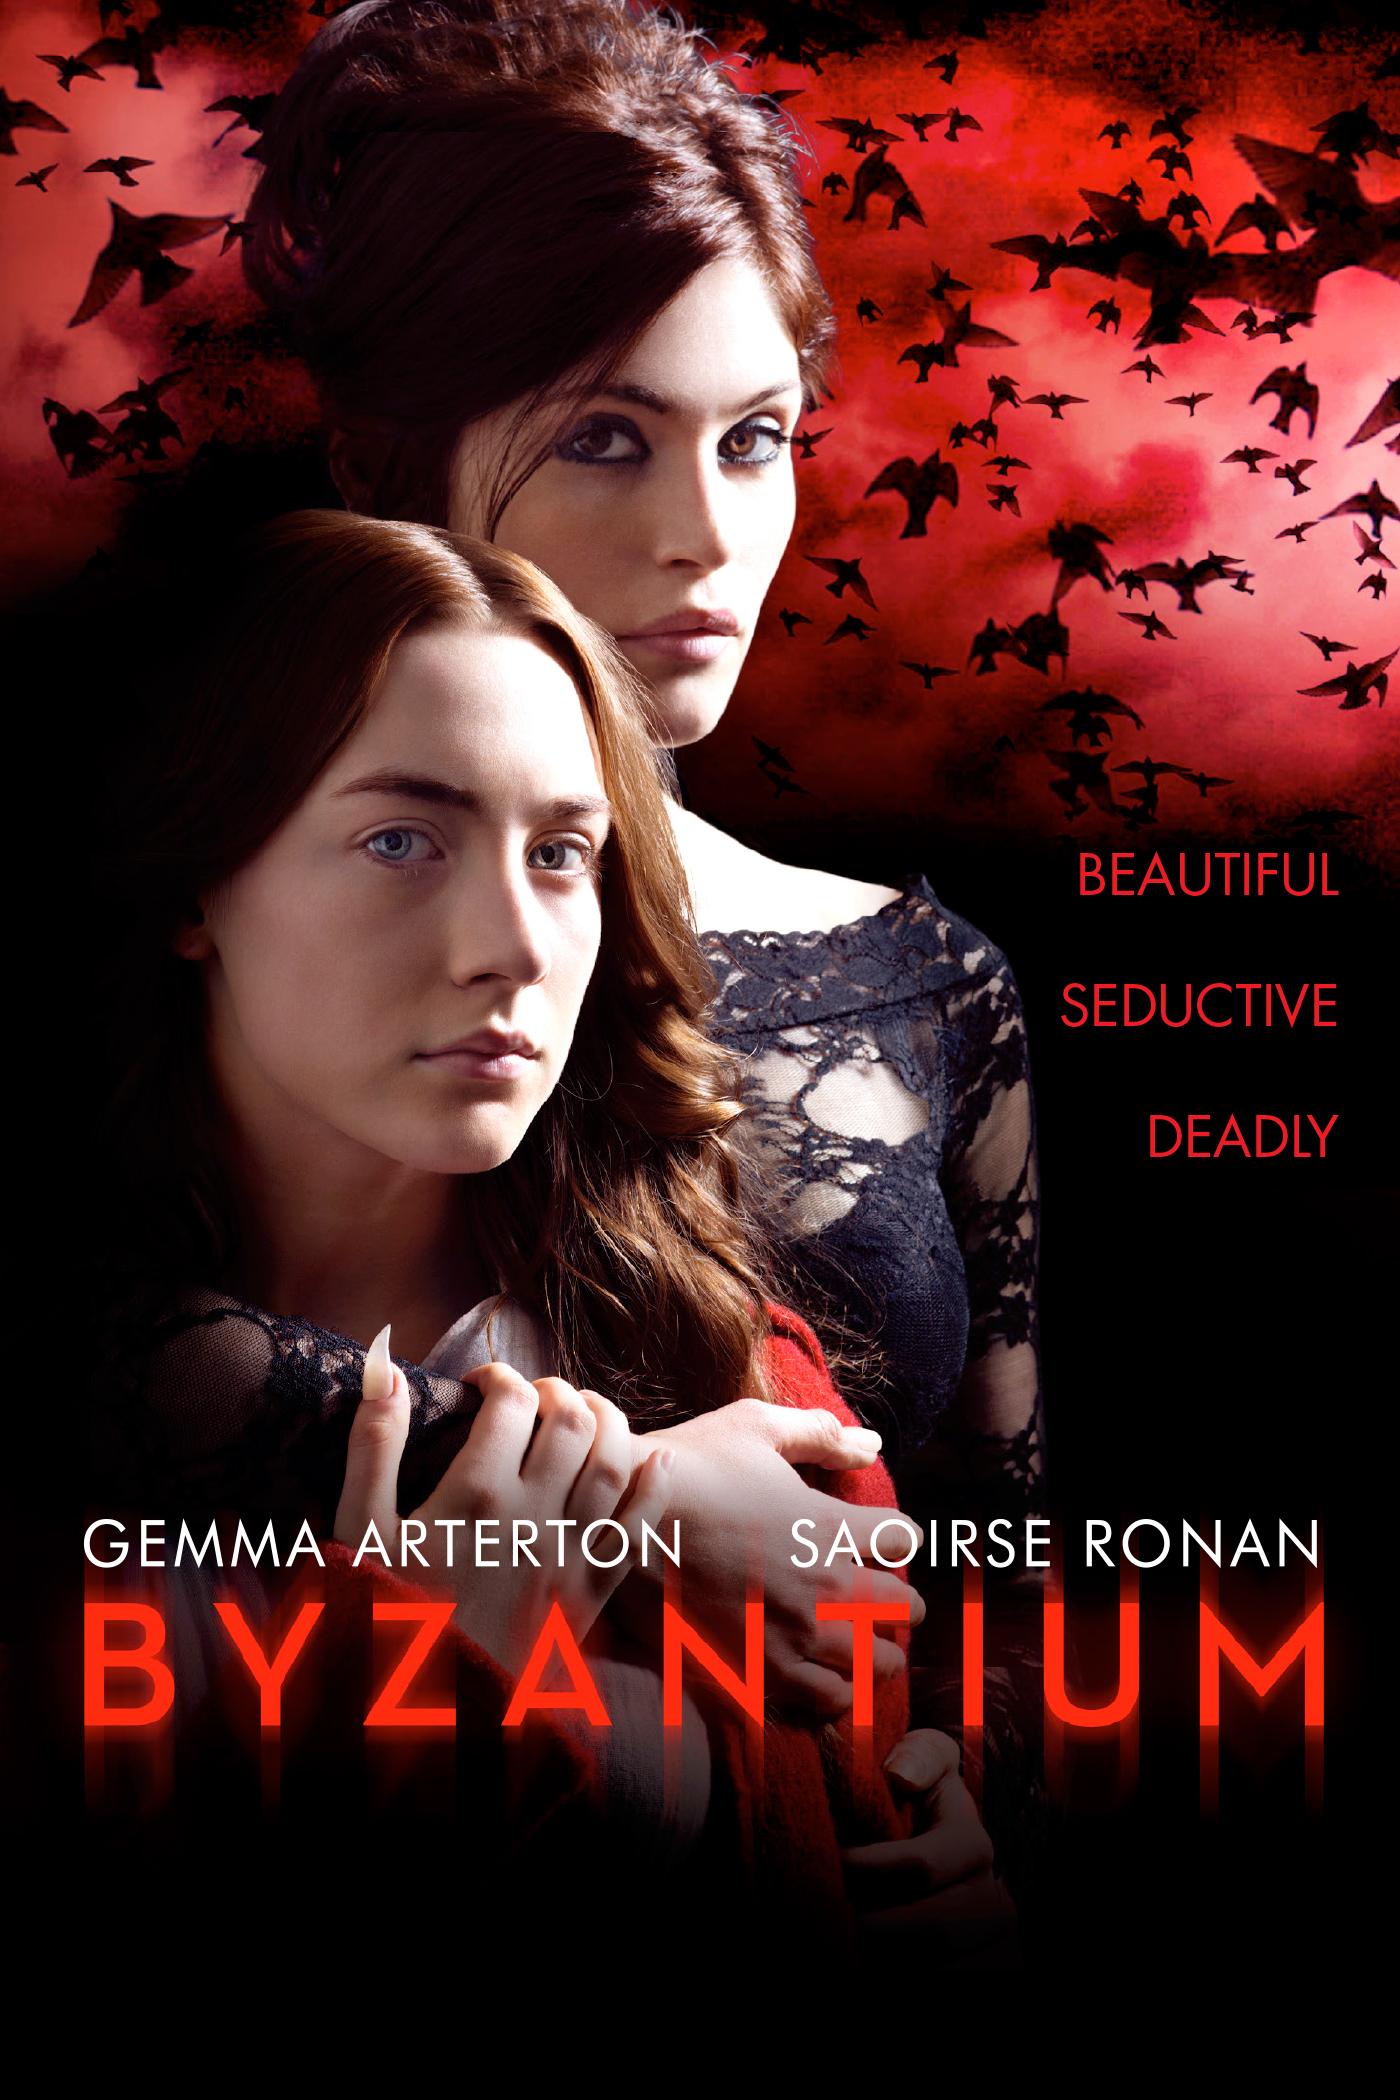 October 22nd: Byzantium (2012)